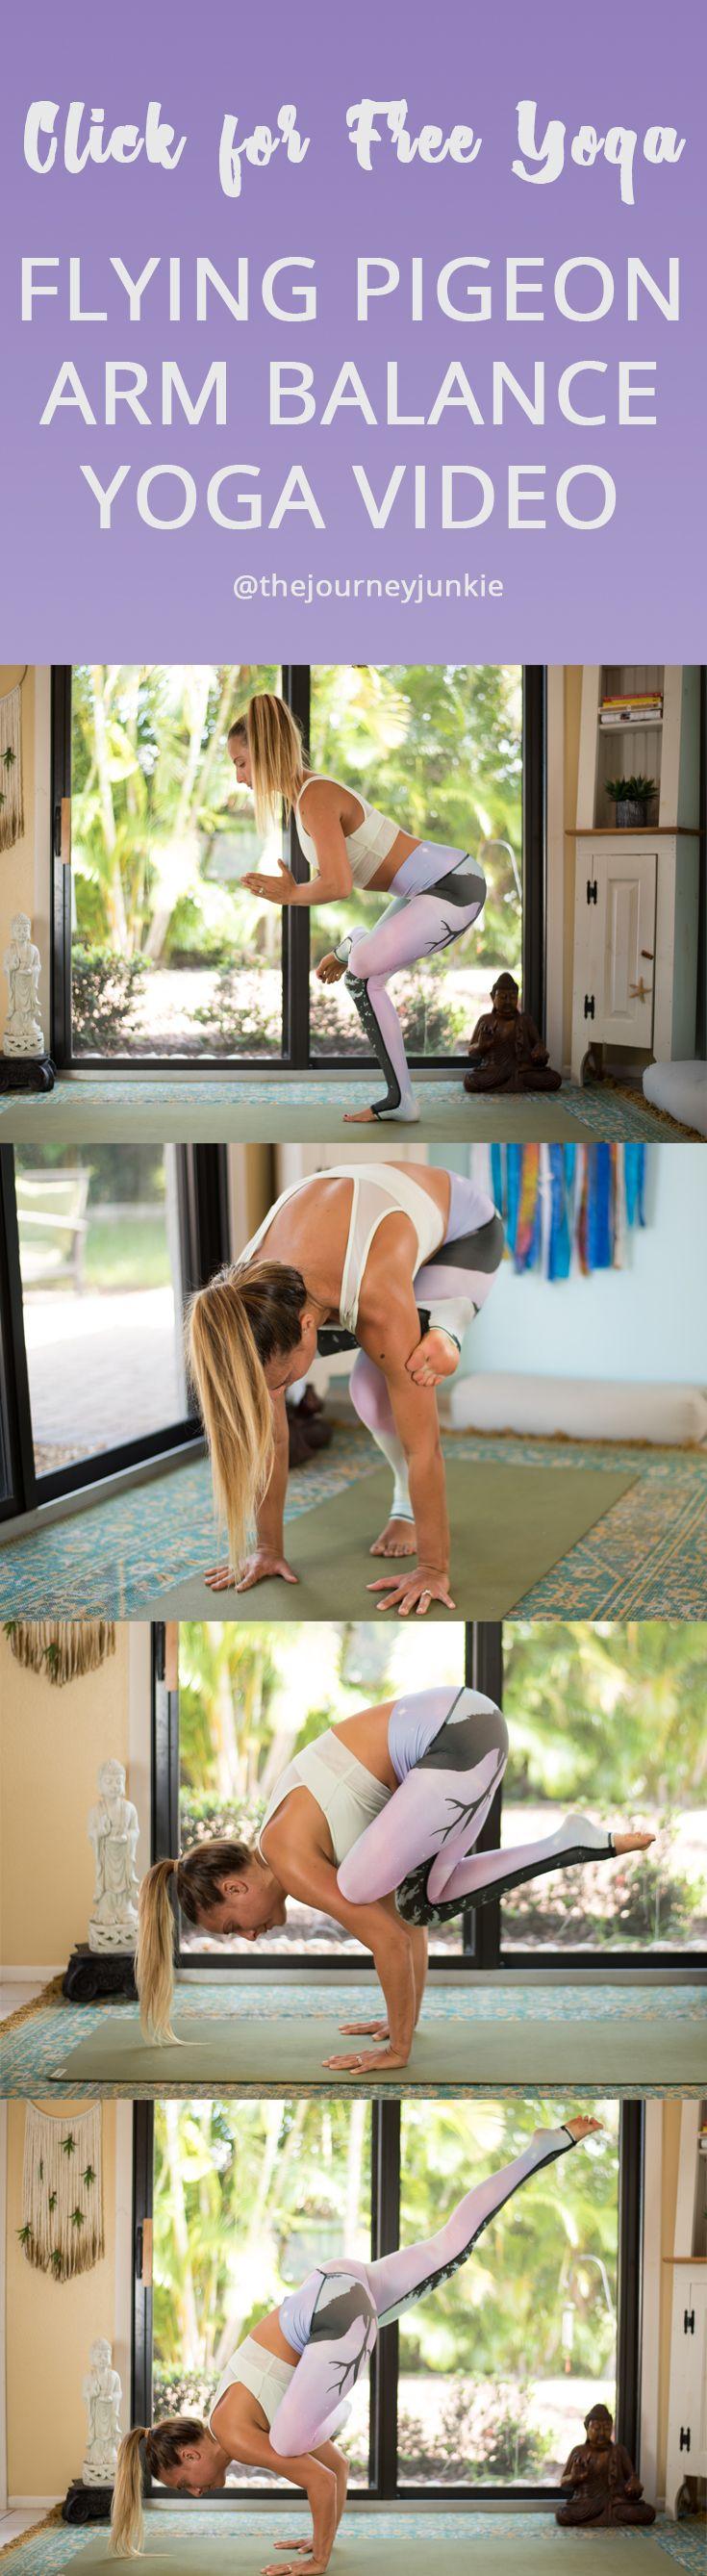 Arm Balance Power Yoga Flow for Flying Pigeon Pose (Eka Pada Galavasana) - Pin n...